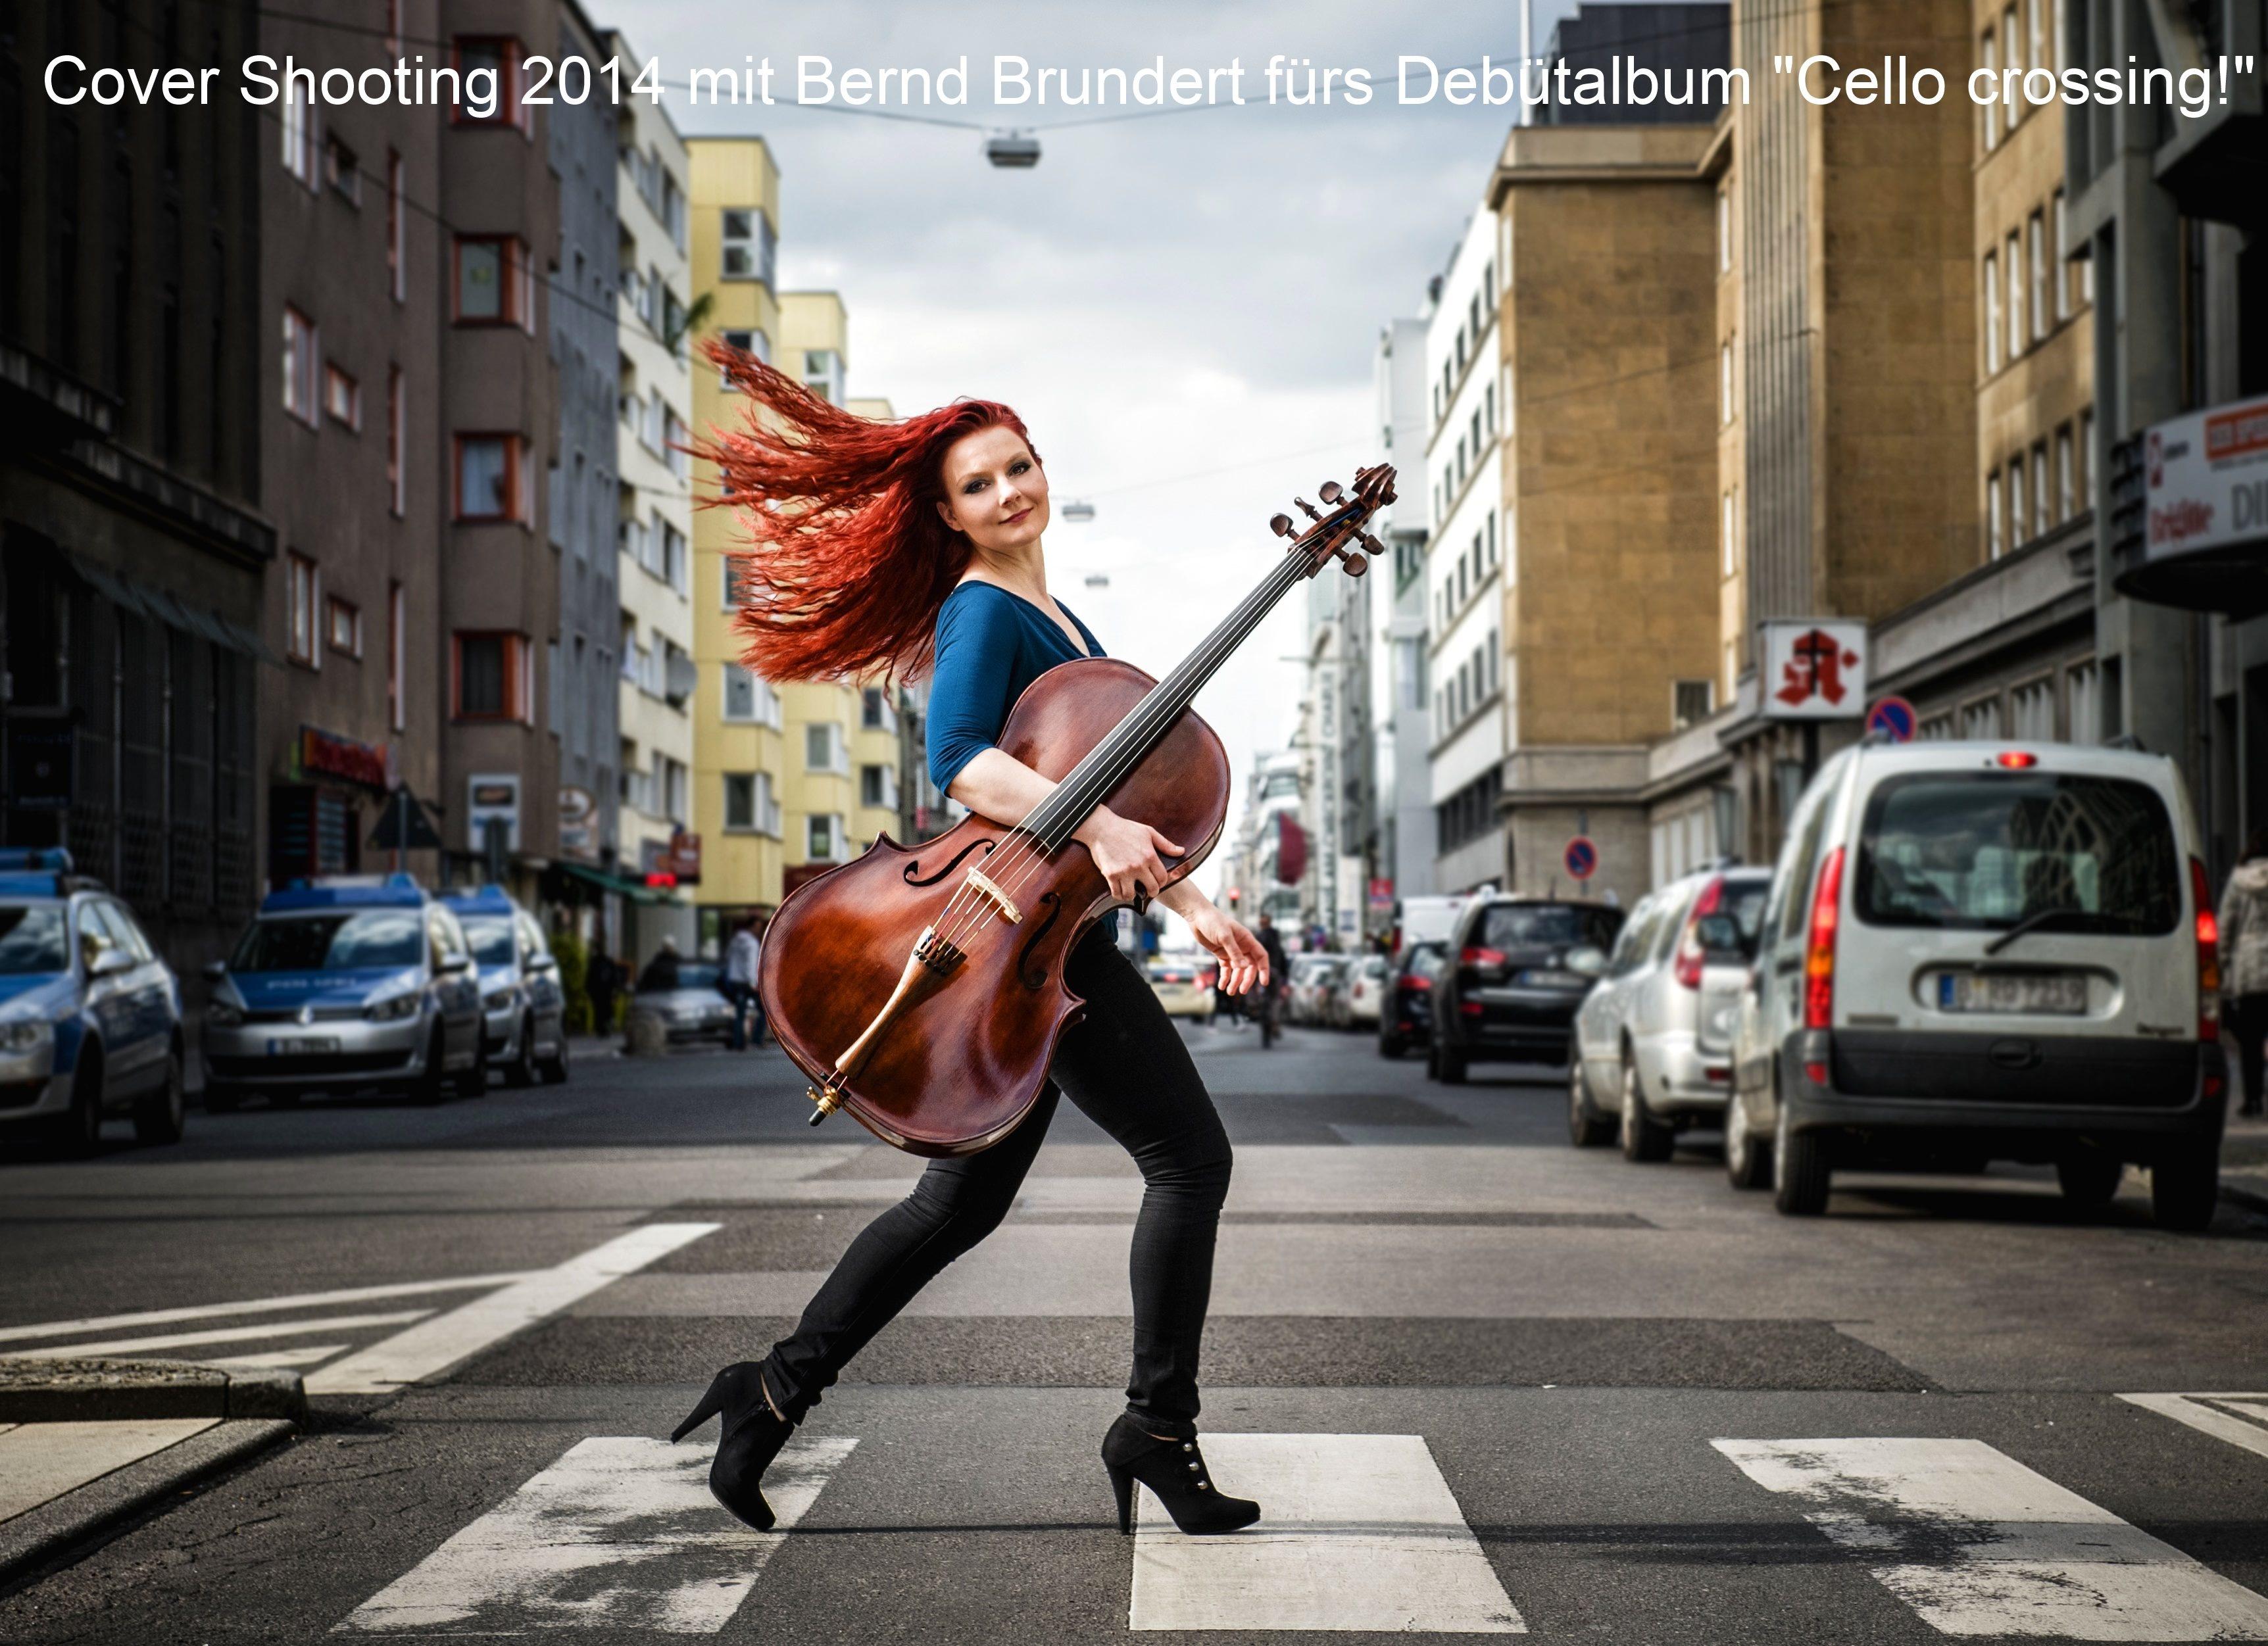 cello_crossing_stefanie_john_foto_bernd_brundert_service_stefaniejohn-cello.de.jpg